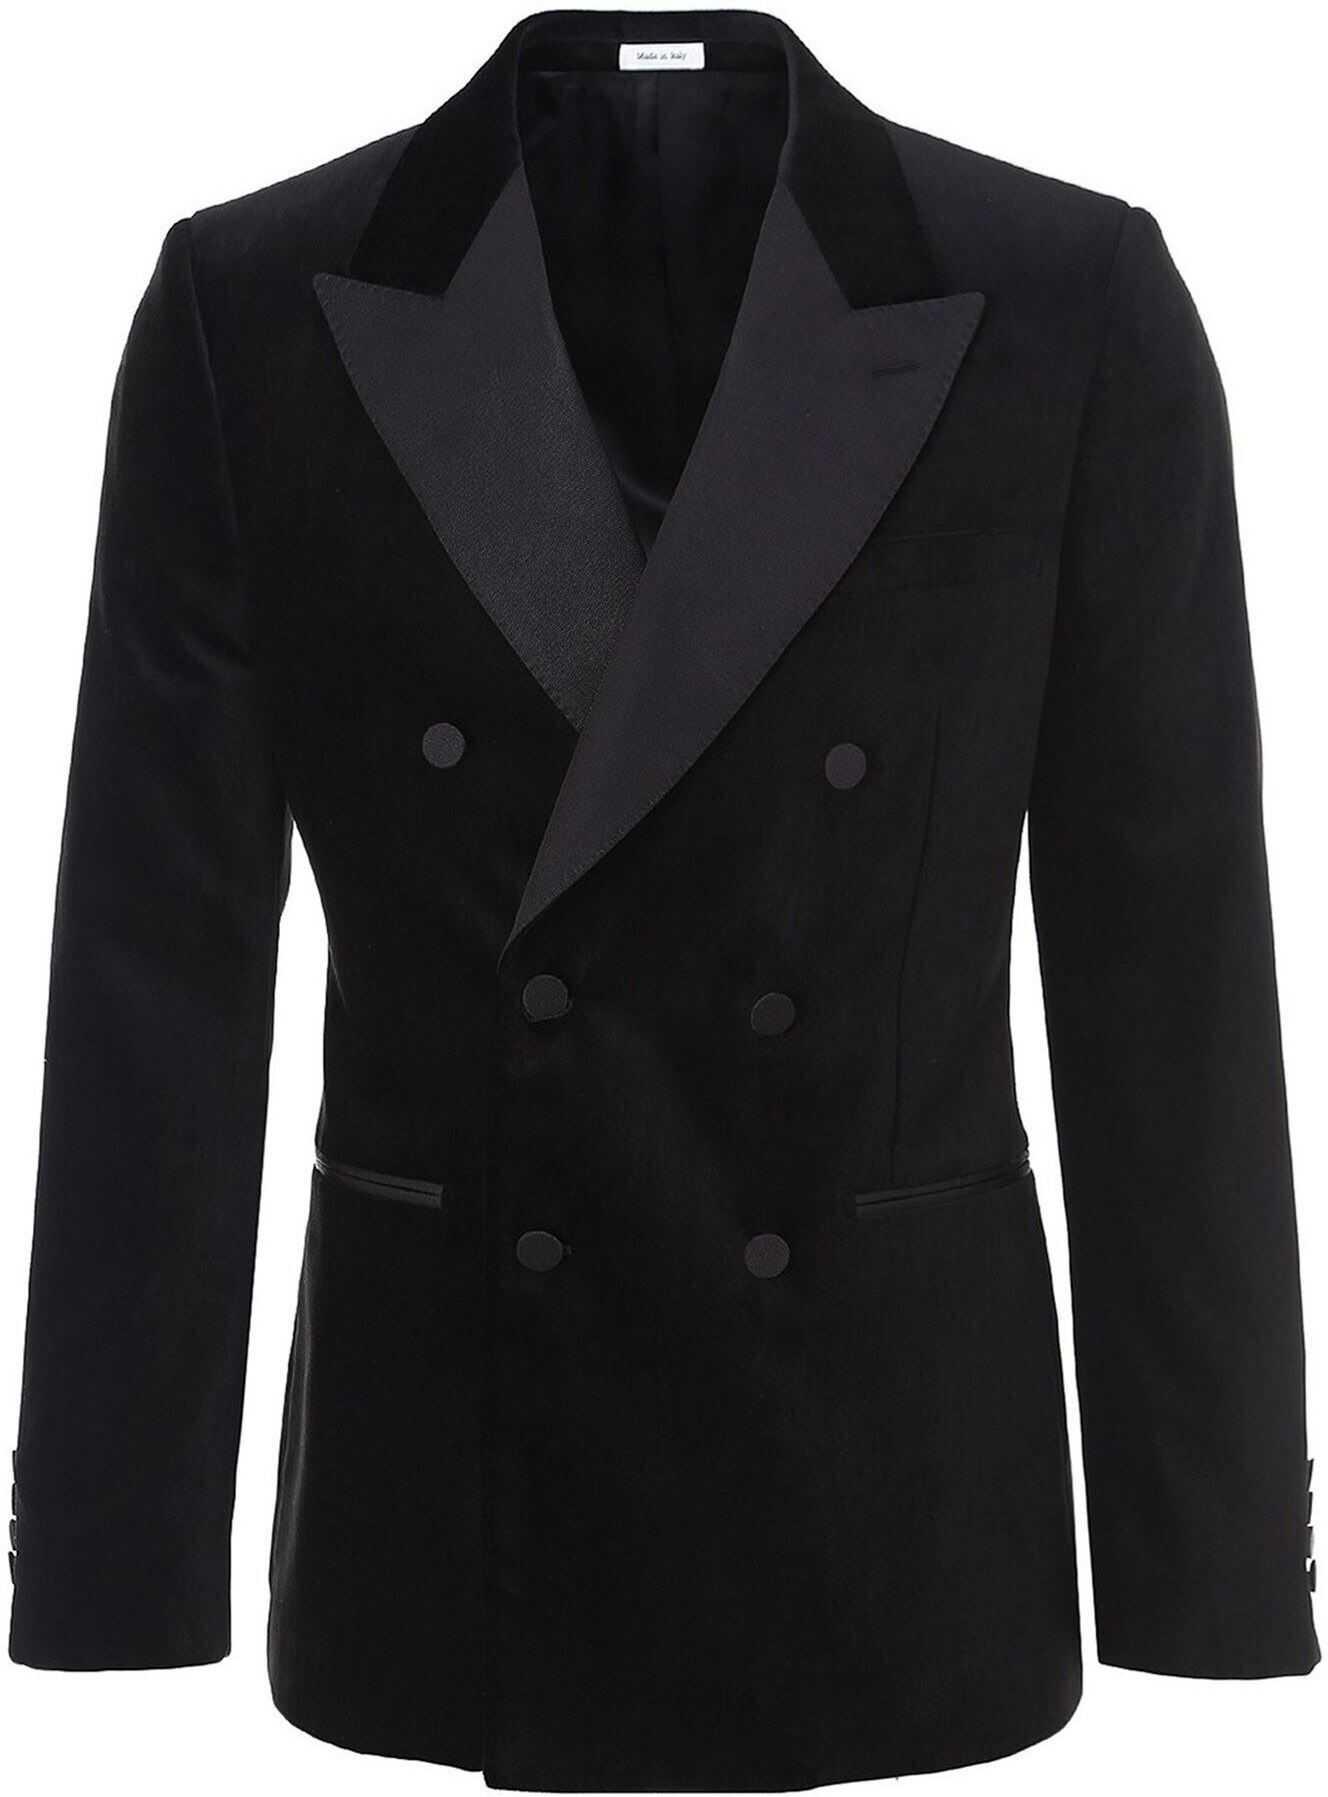 Alexander McQueen Velvet Blazer In Black Black imagine